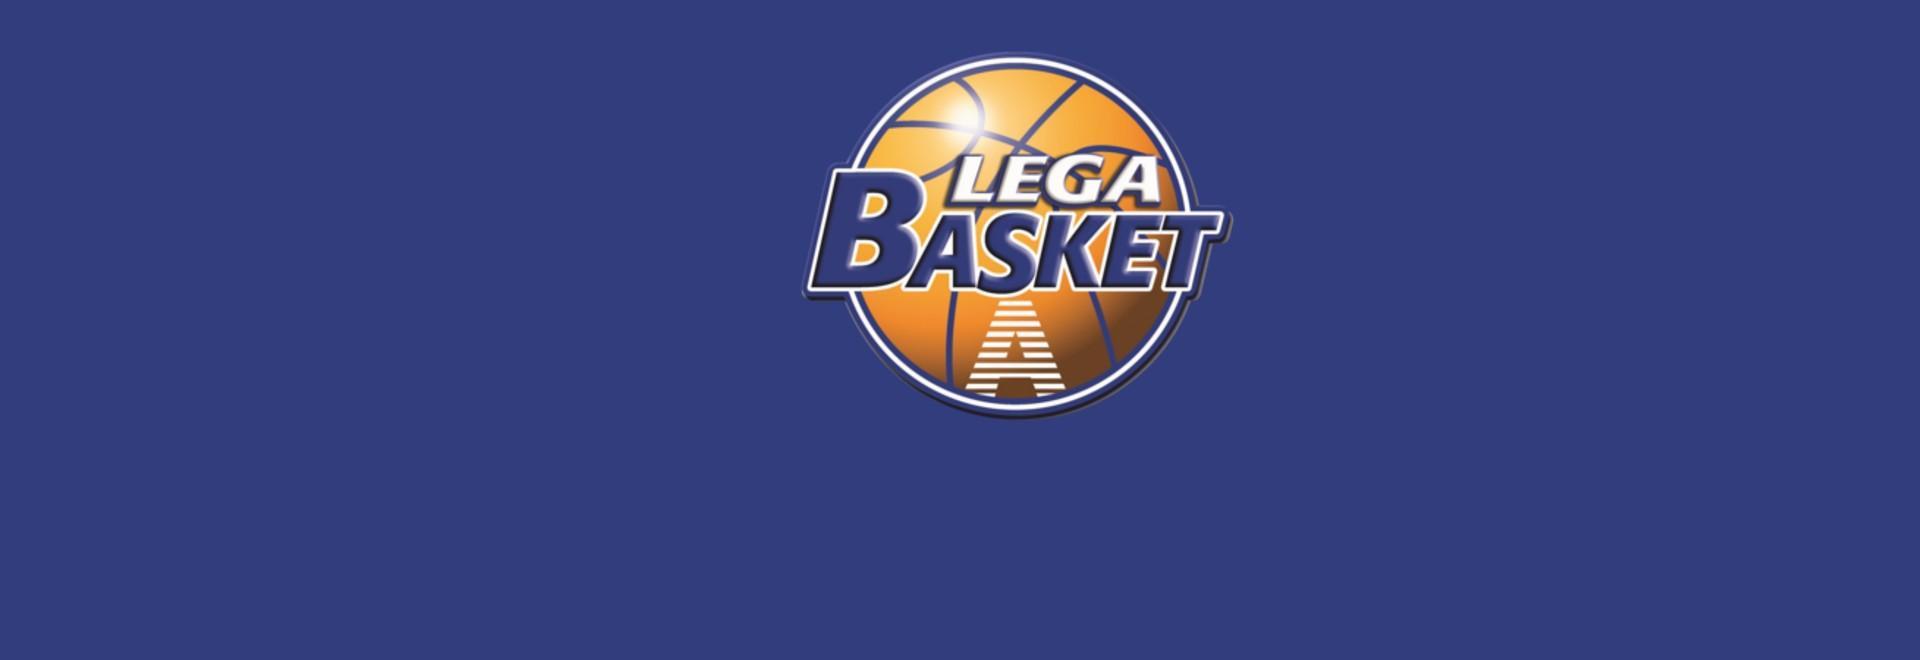 Serie A Basket